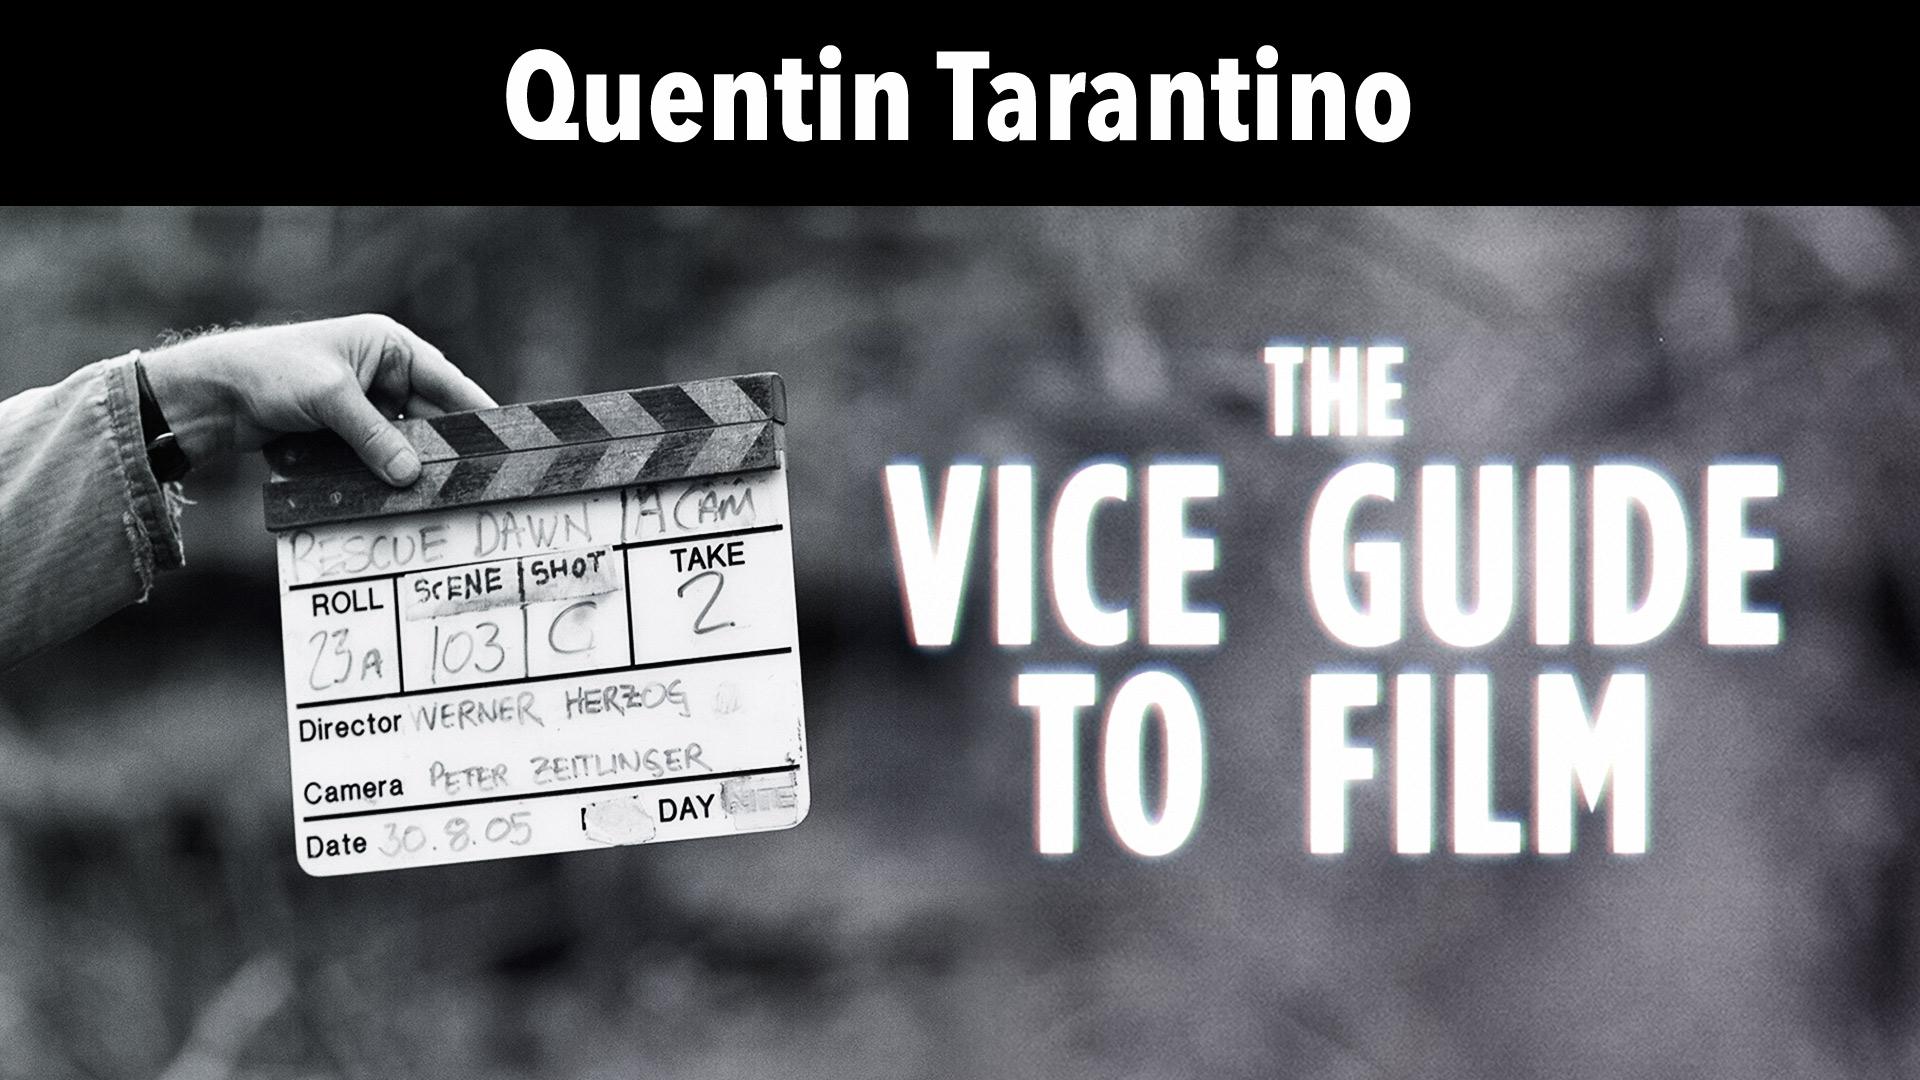 Quentin Tarantino: Vice Guide To Film